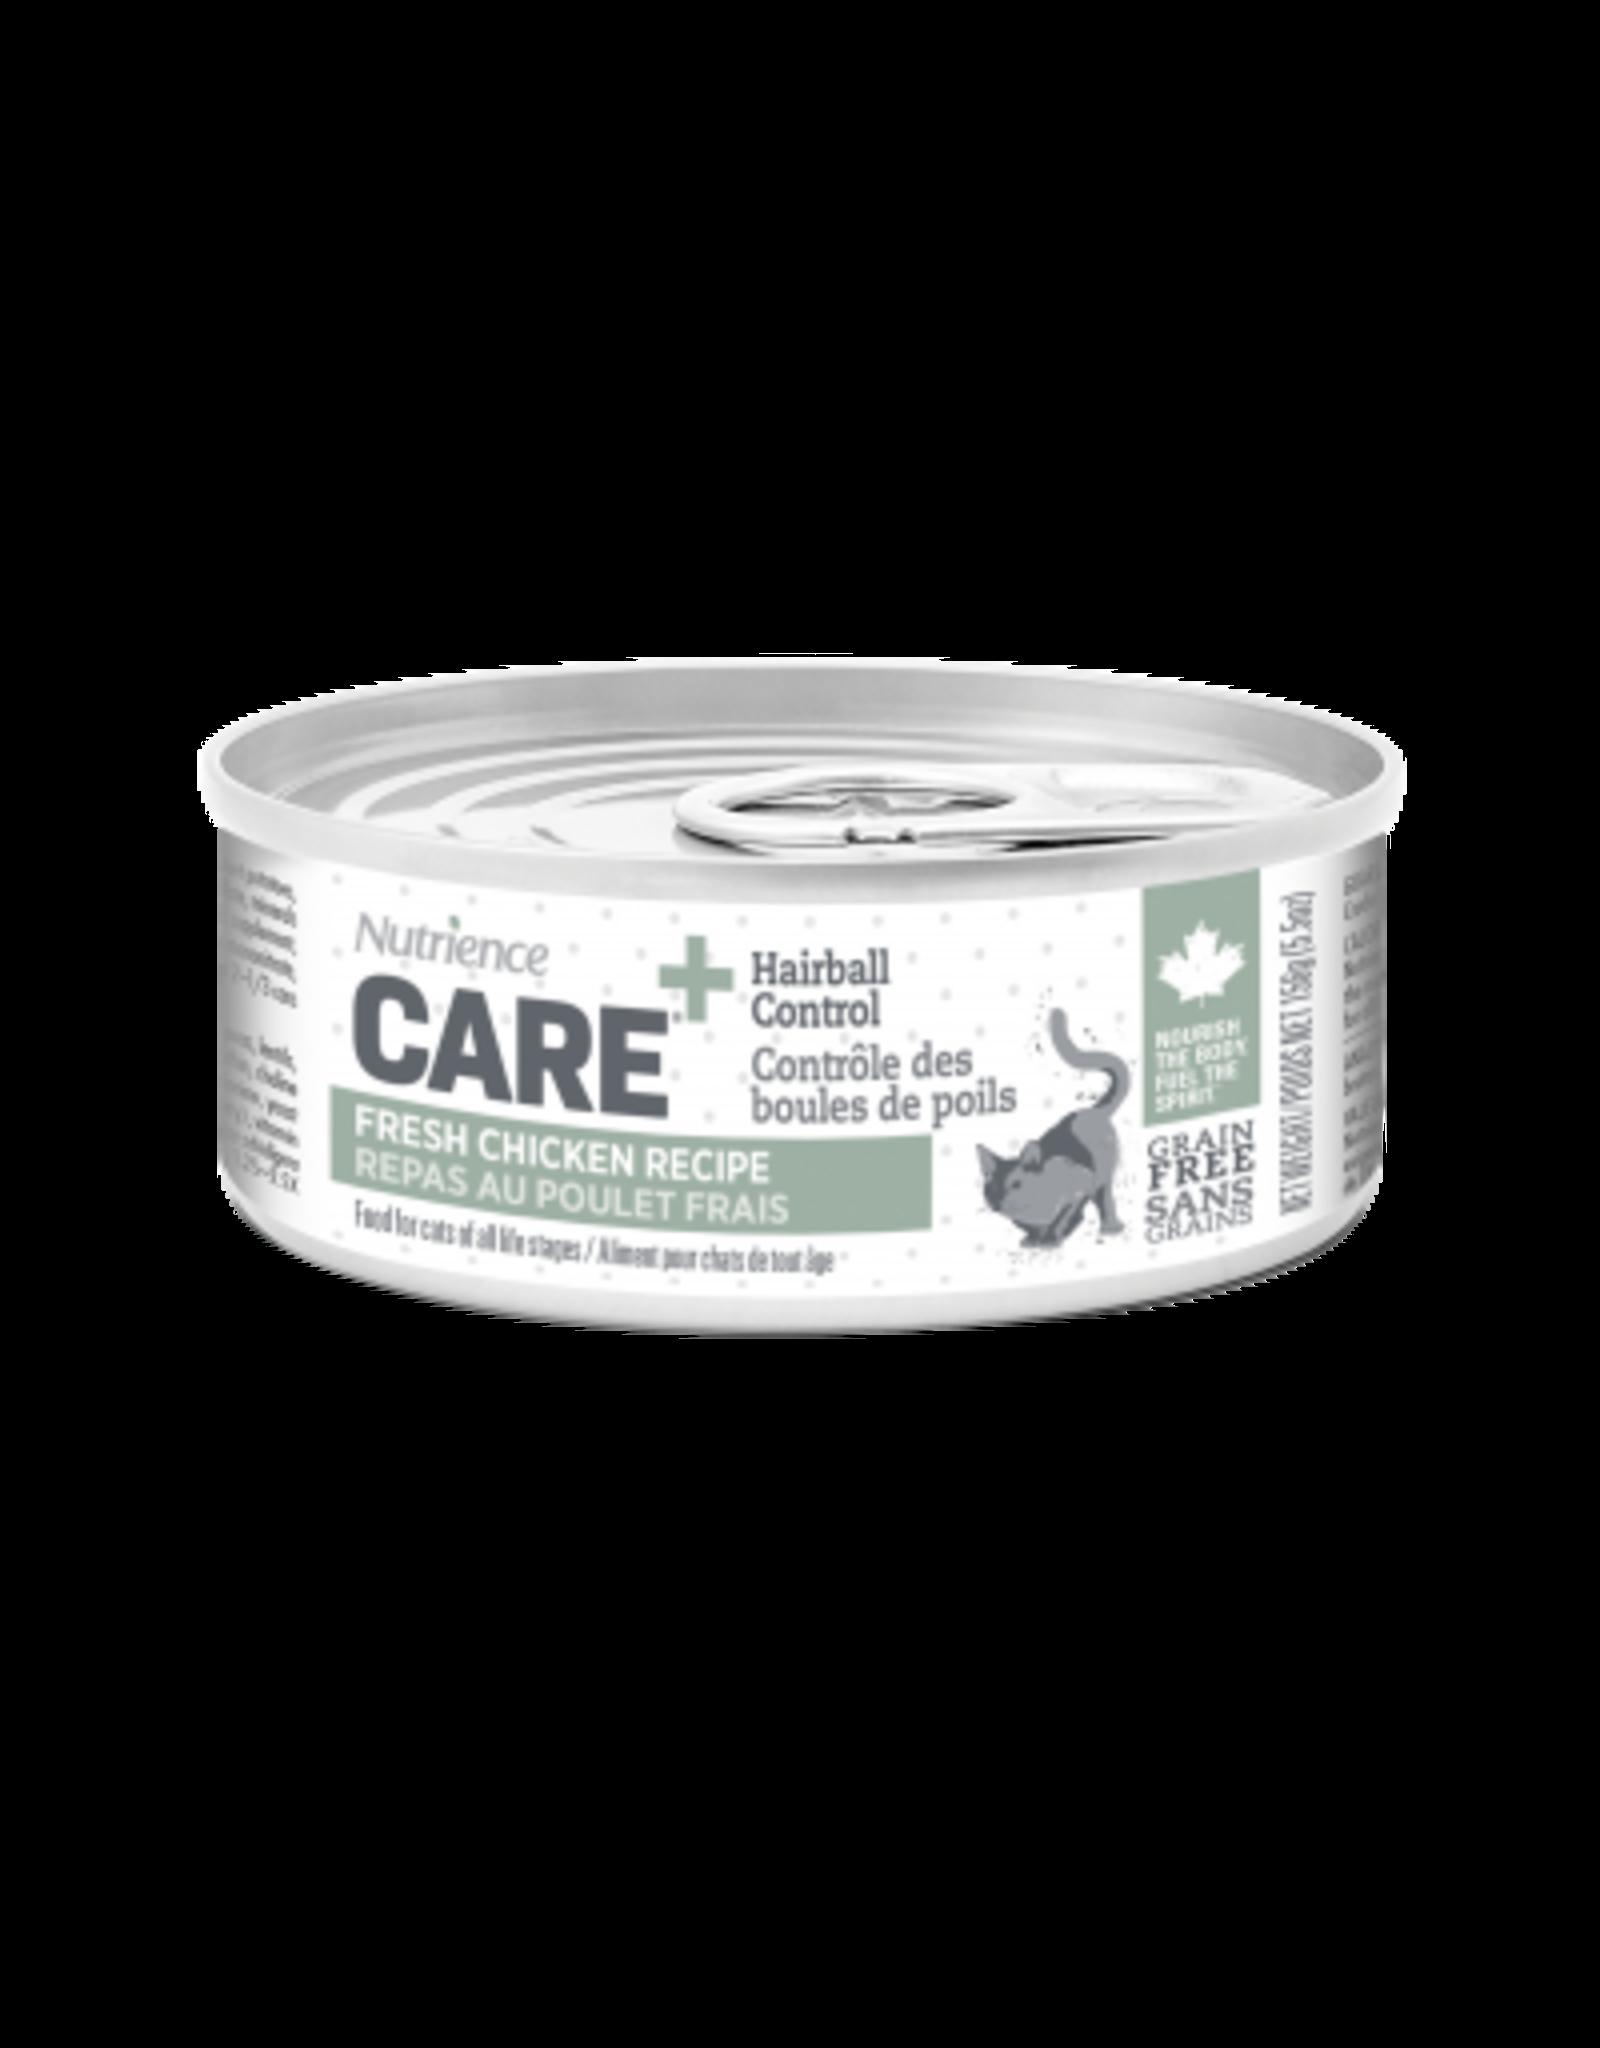 Nutrience Nutrience Care Hairball Control 156g